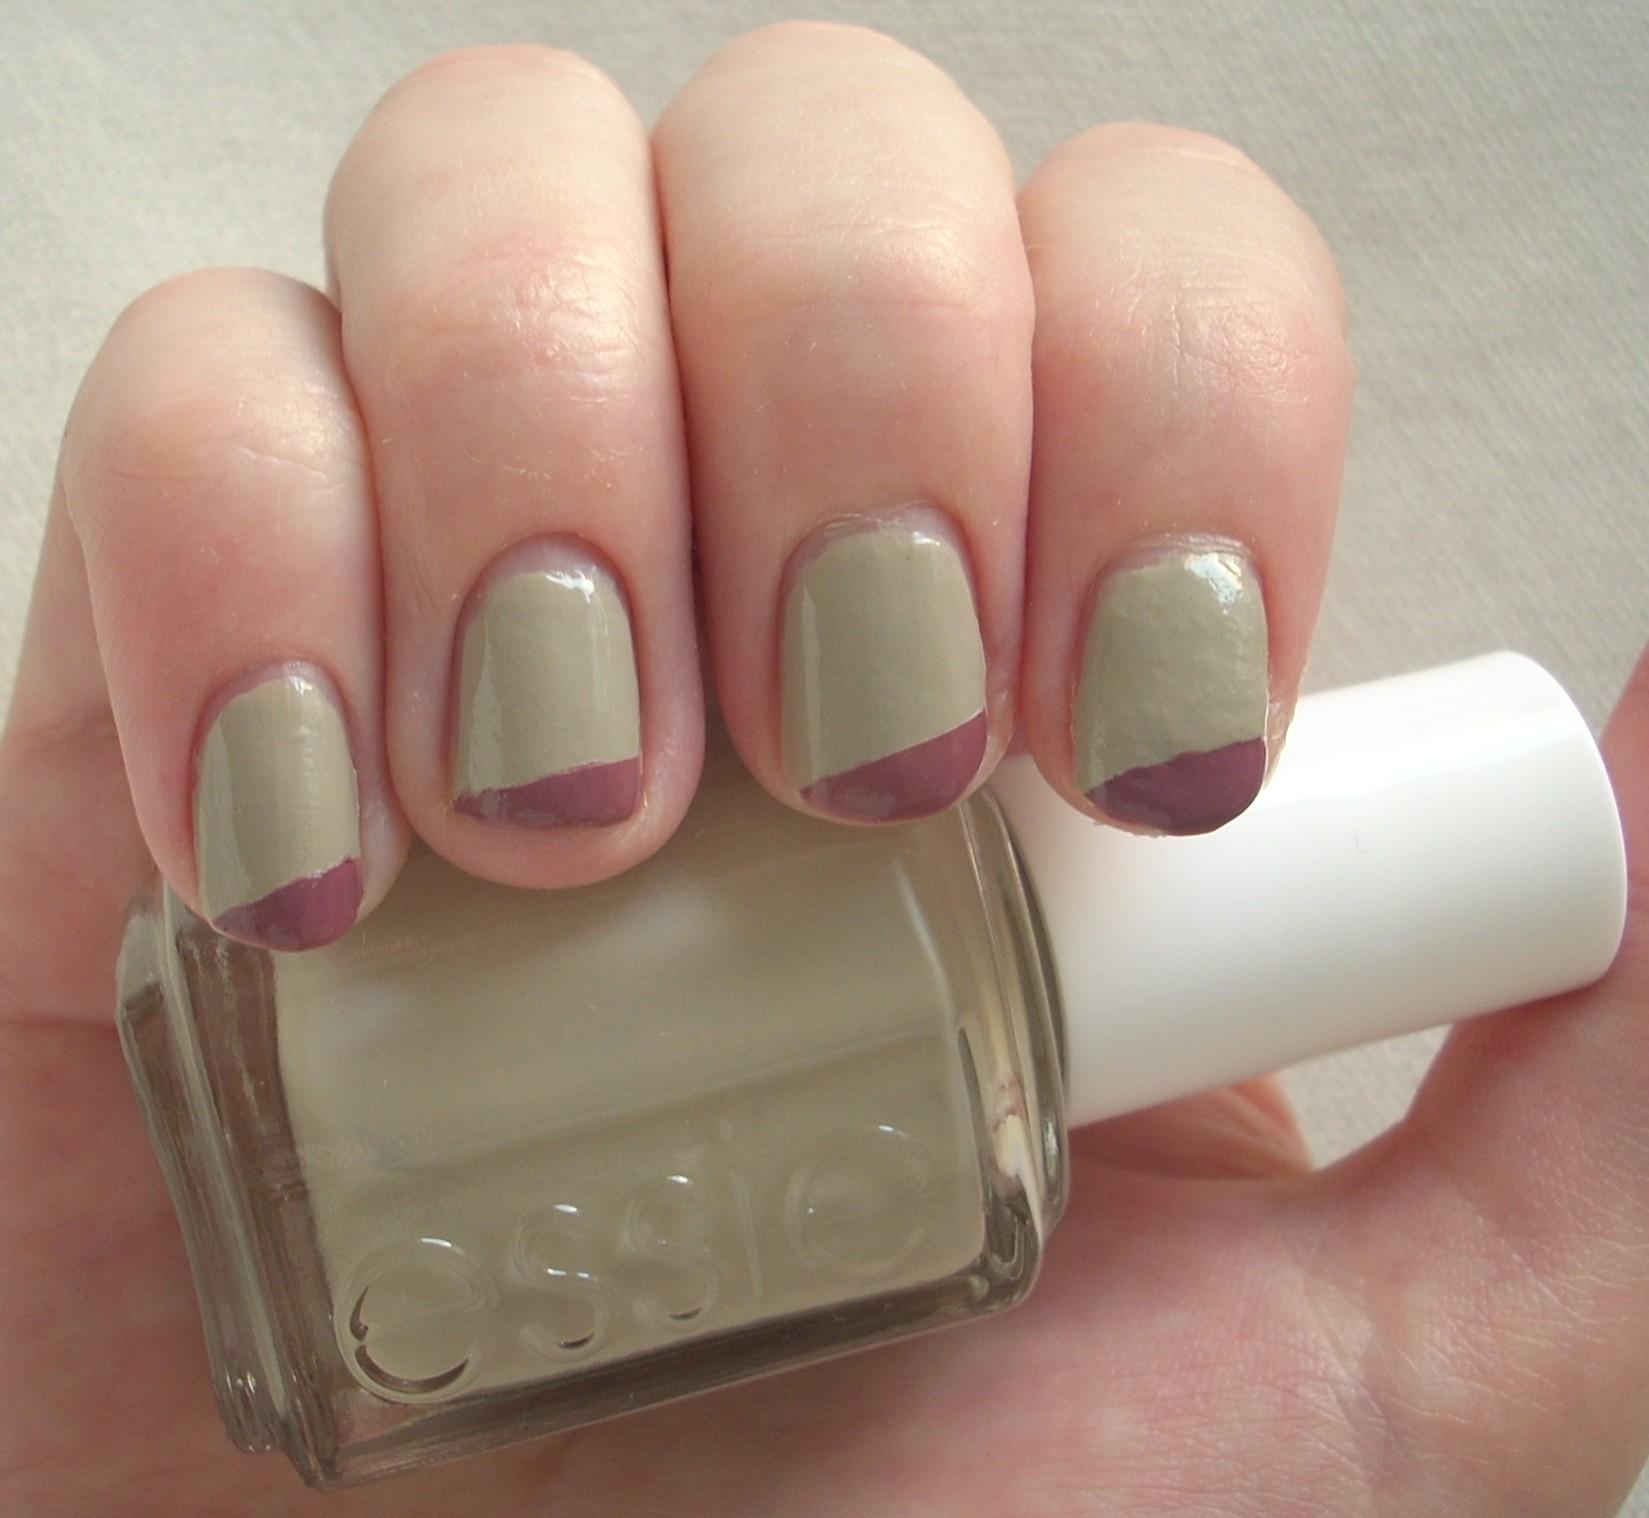 Essie Playa del Platinum nail polish review | Through The Looking Glass